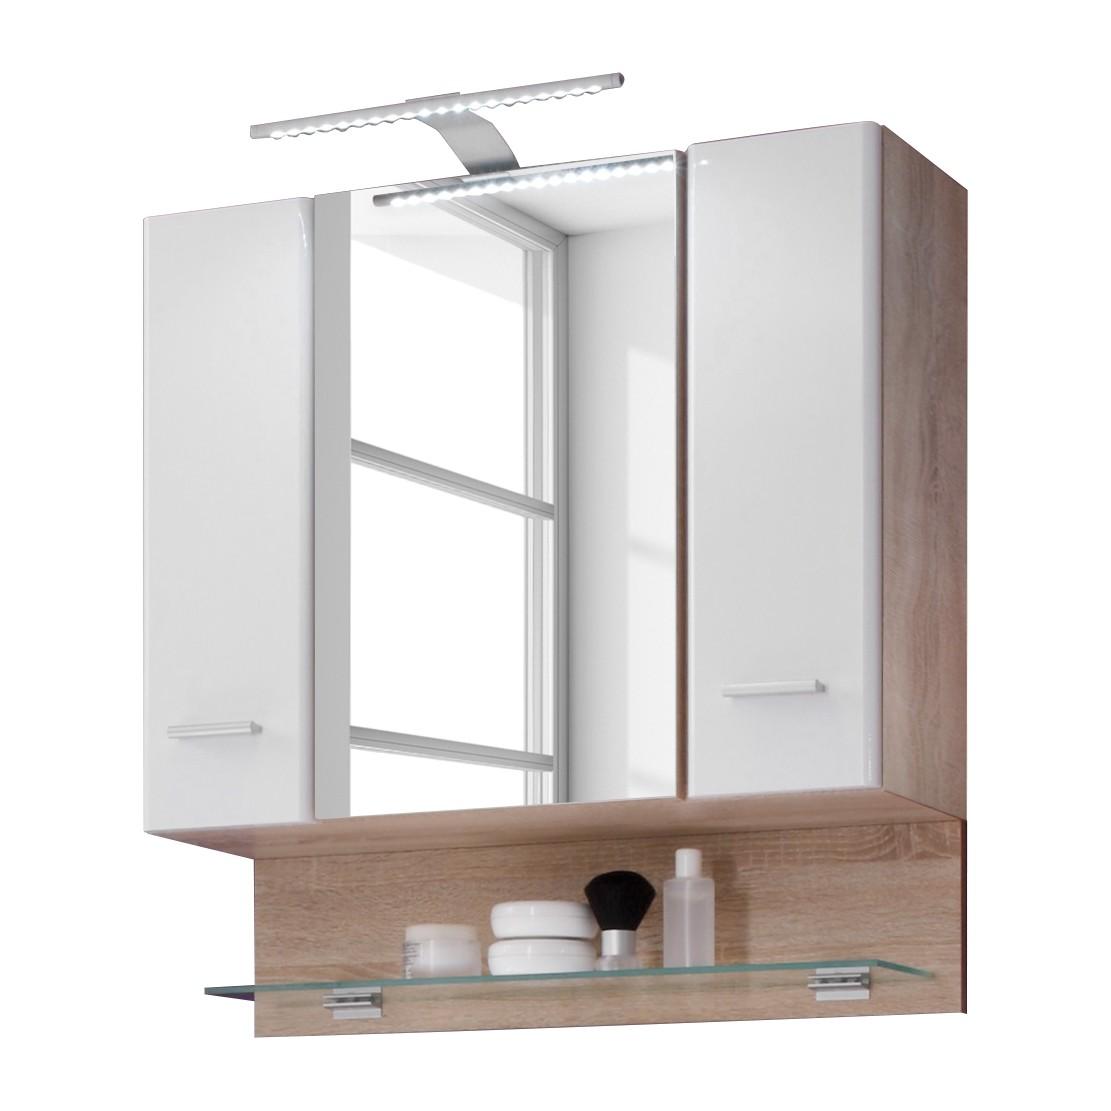 armoire de salle bain narrows avec clairage blanc brillant imitation ch ne de sonoma. Black Bedroom Furniture Sets. Home Design Ideas